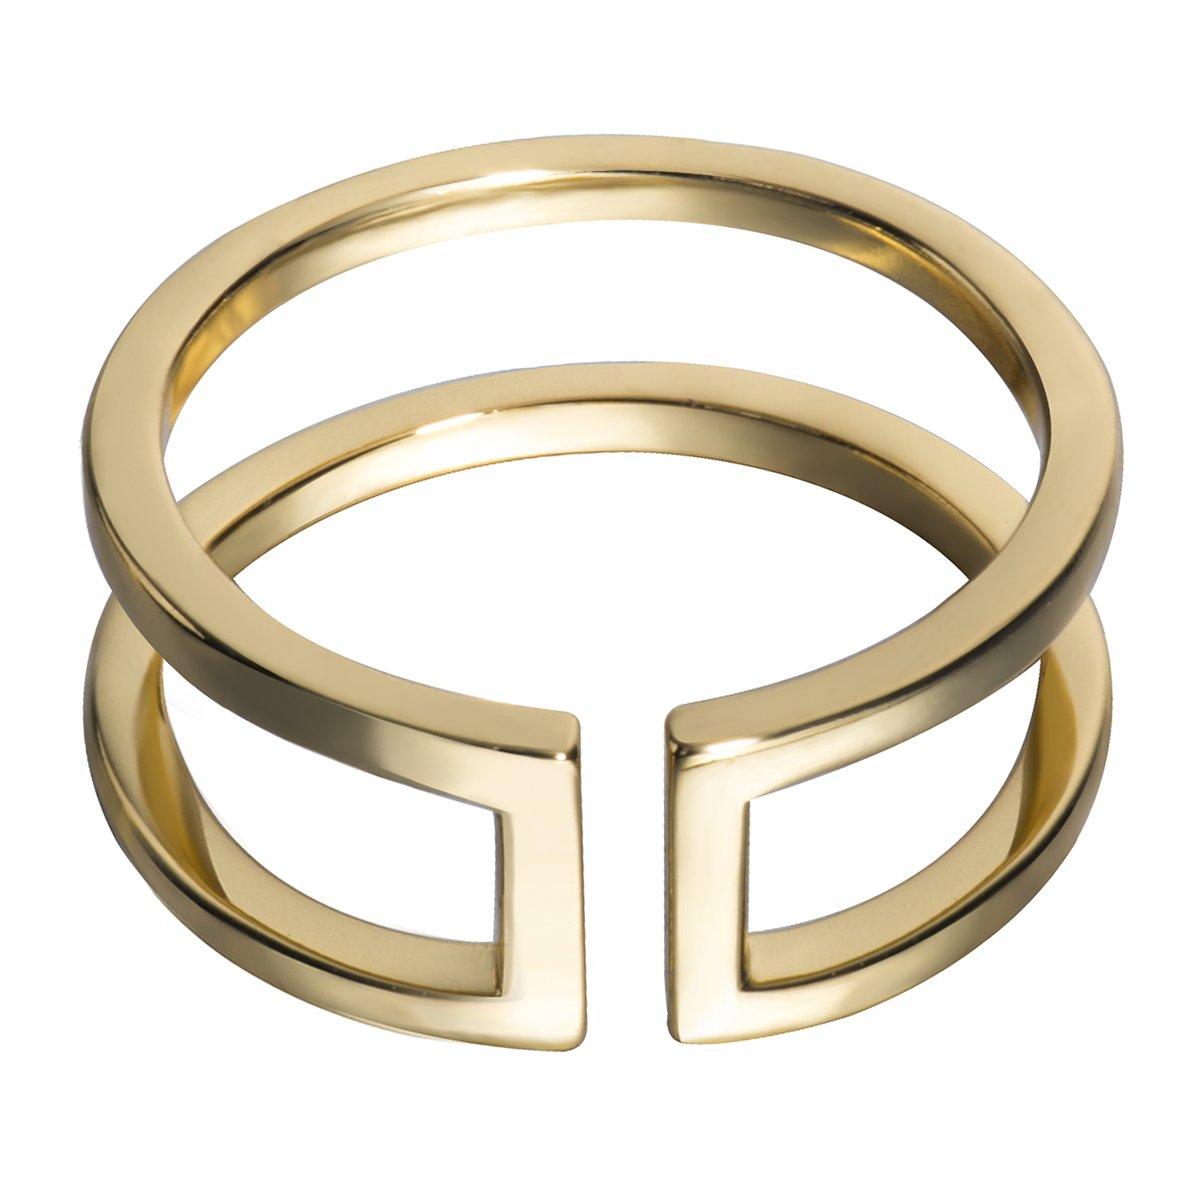 Fonsalette Open Bar Ring Sterling Silver Double Line Bar Ring Parallel Bar Ring (gold, 8)